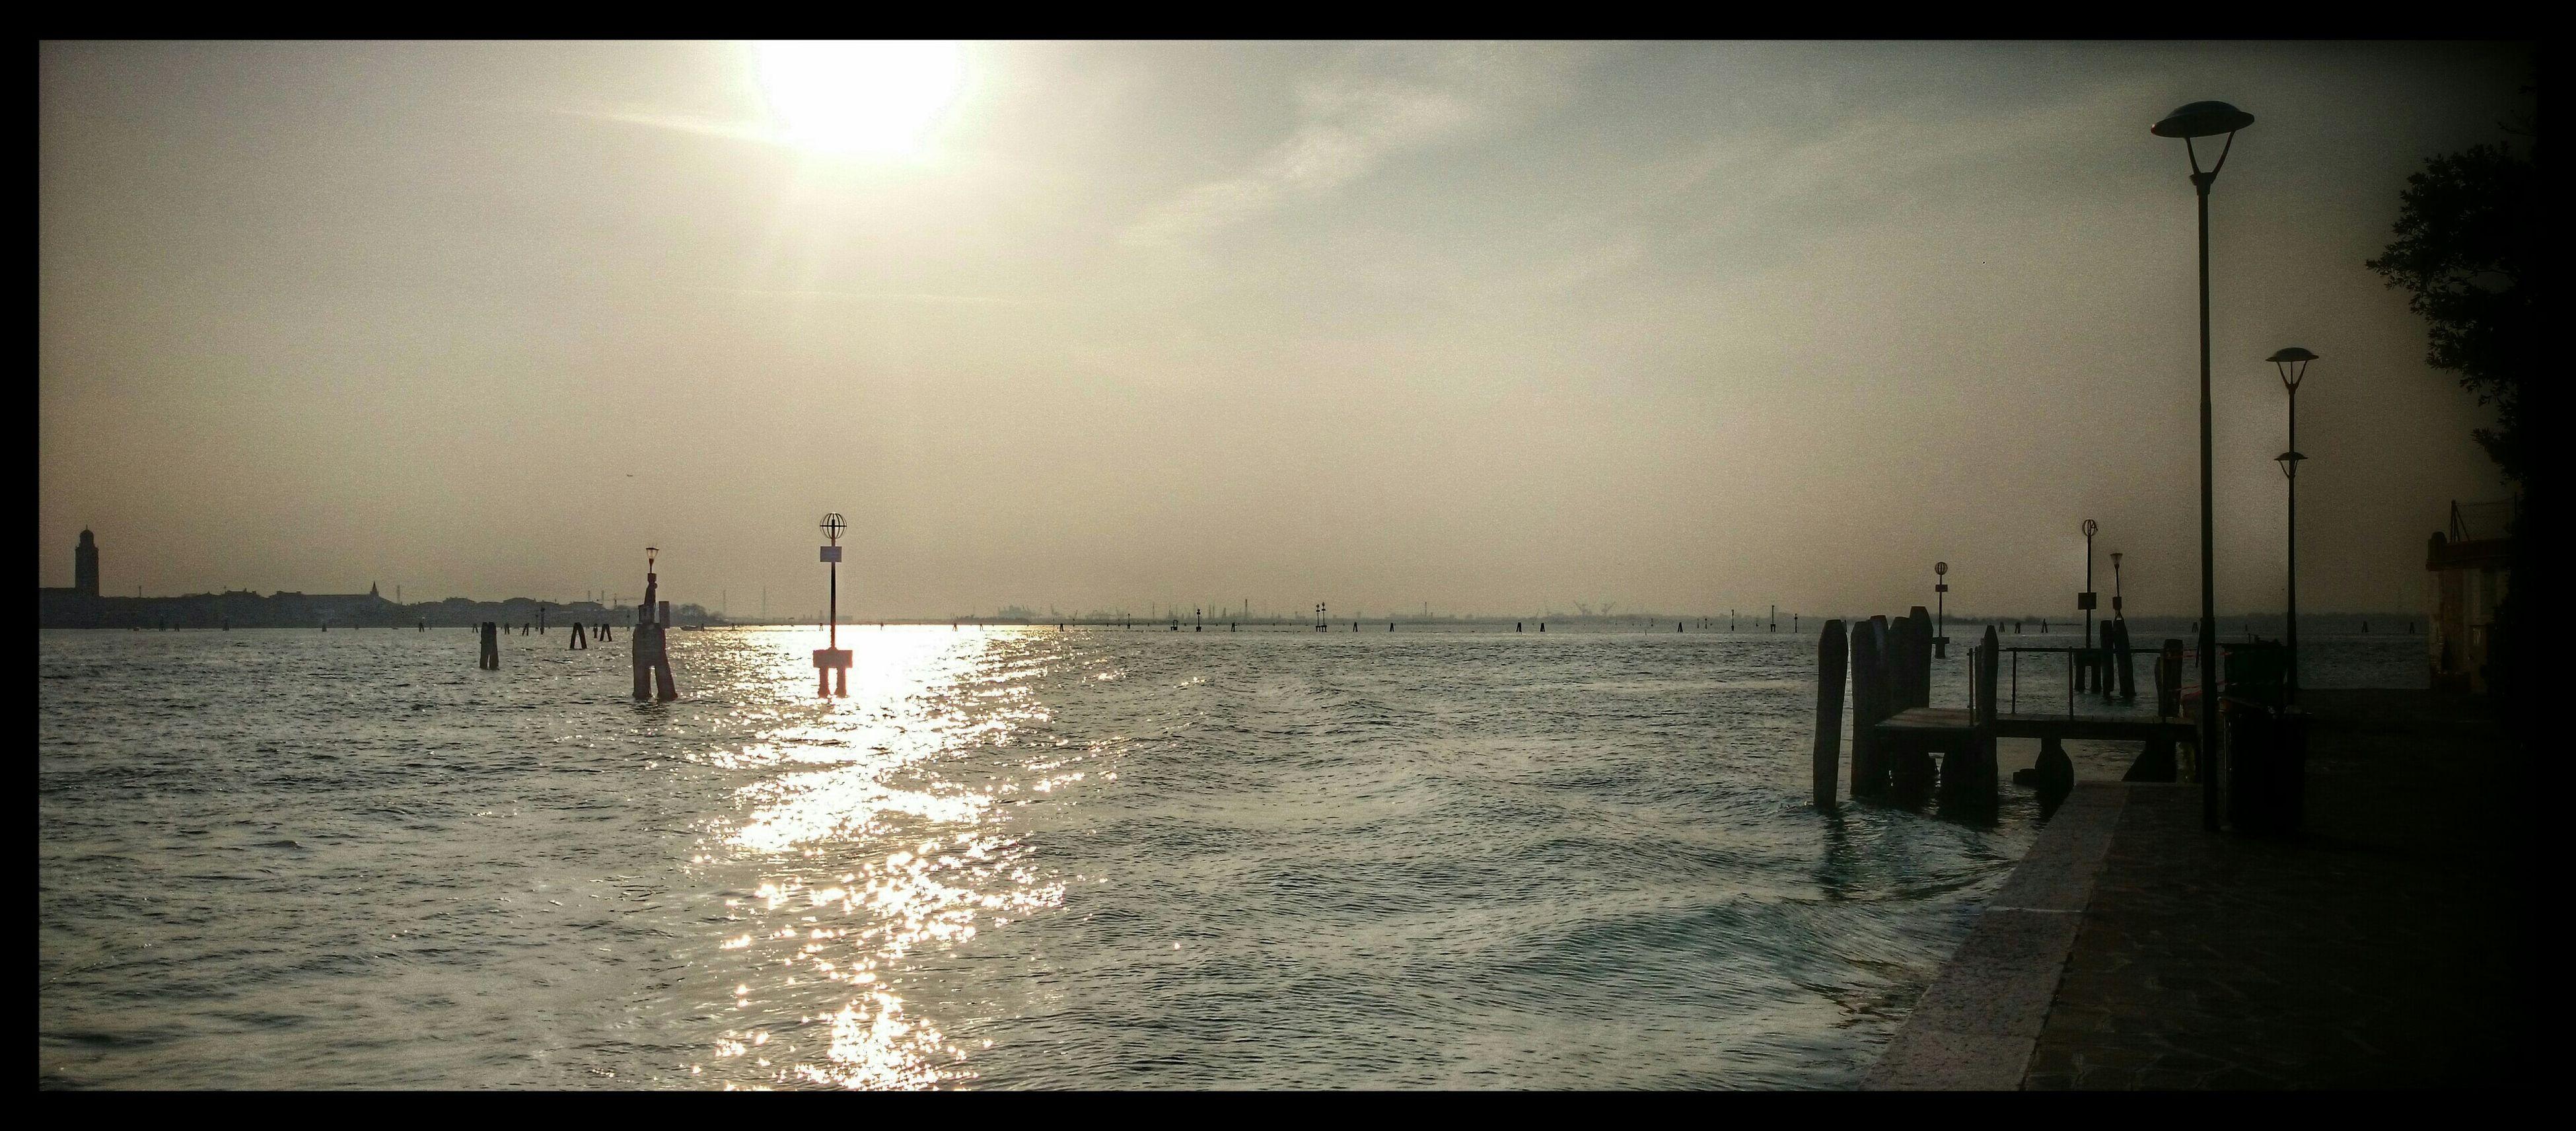 water, sea, horizon over water, transfer print, tranquility, sky, tranquil scene, scenics, beauty in nature, pier, beach, sun, nature, auto post production filter, sunset, shore, idyllic, reflection, street light, sunlight